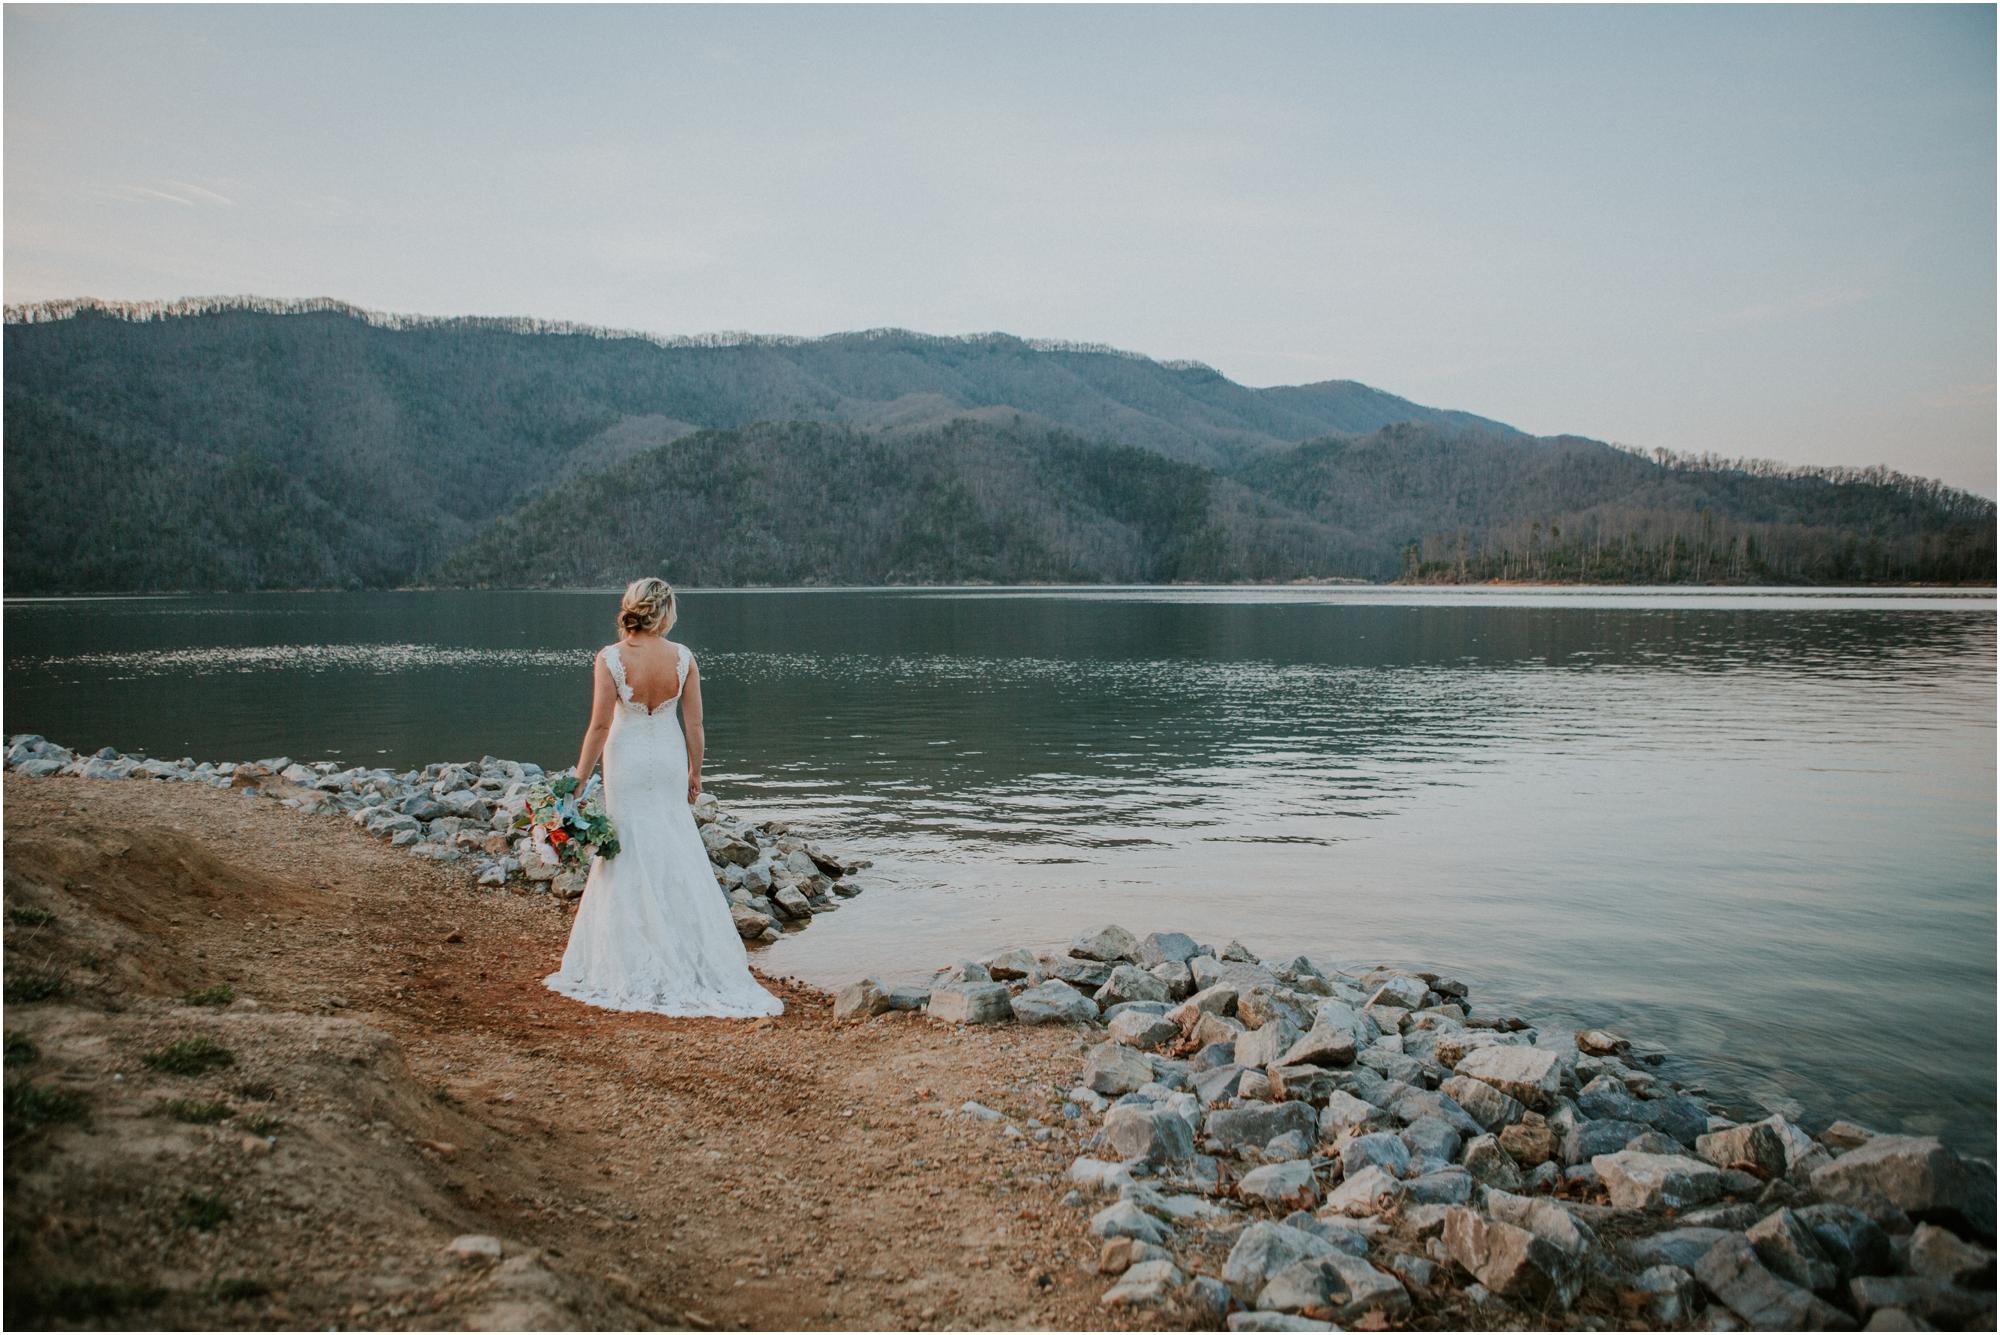 watauga-lake--bohemian-bridal-styled-session-northeast-tennessee-wedding-elopement-photography_0019.jpg